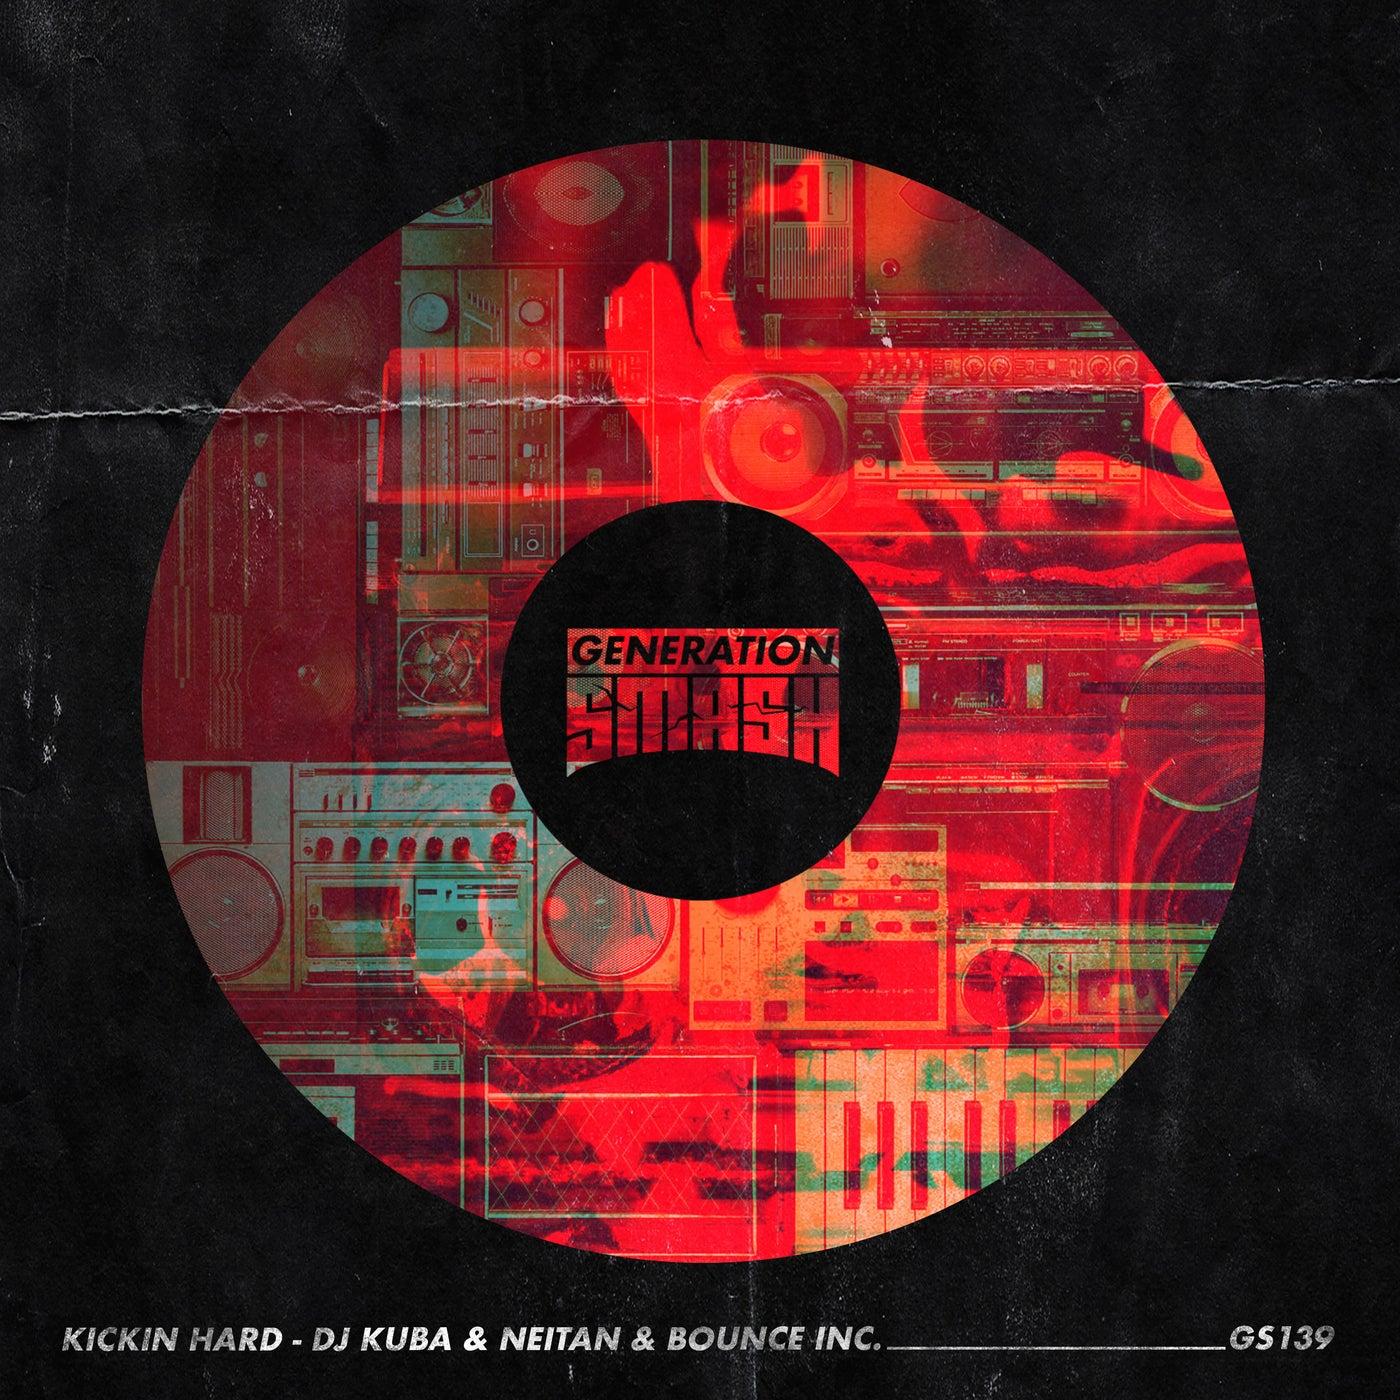 Kickin Hard (Vip Extended Mix)